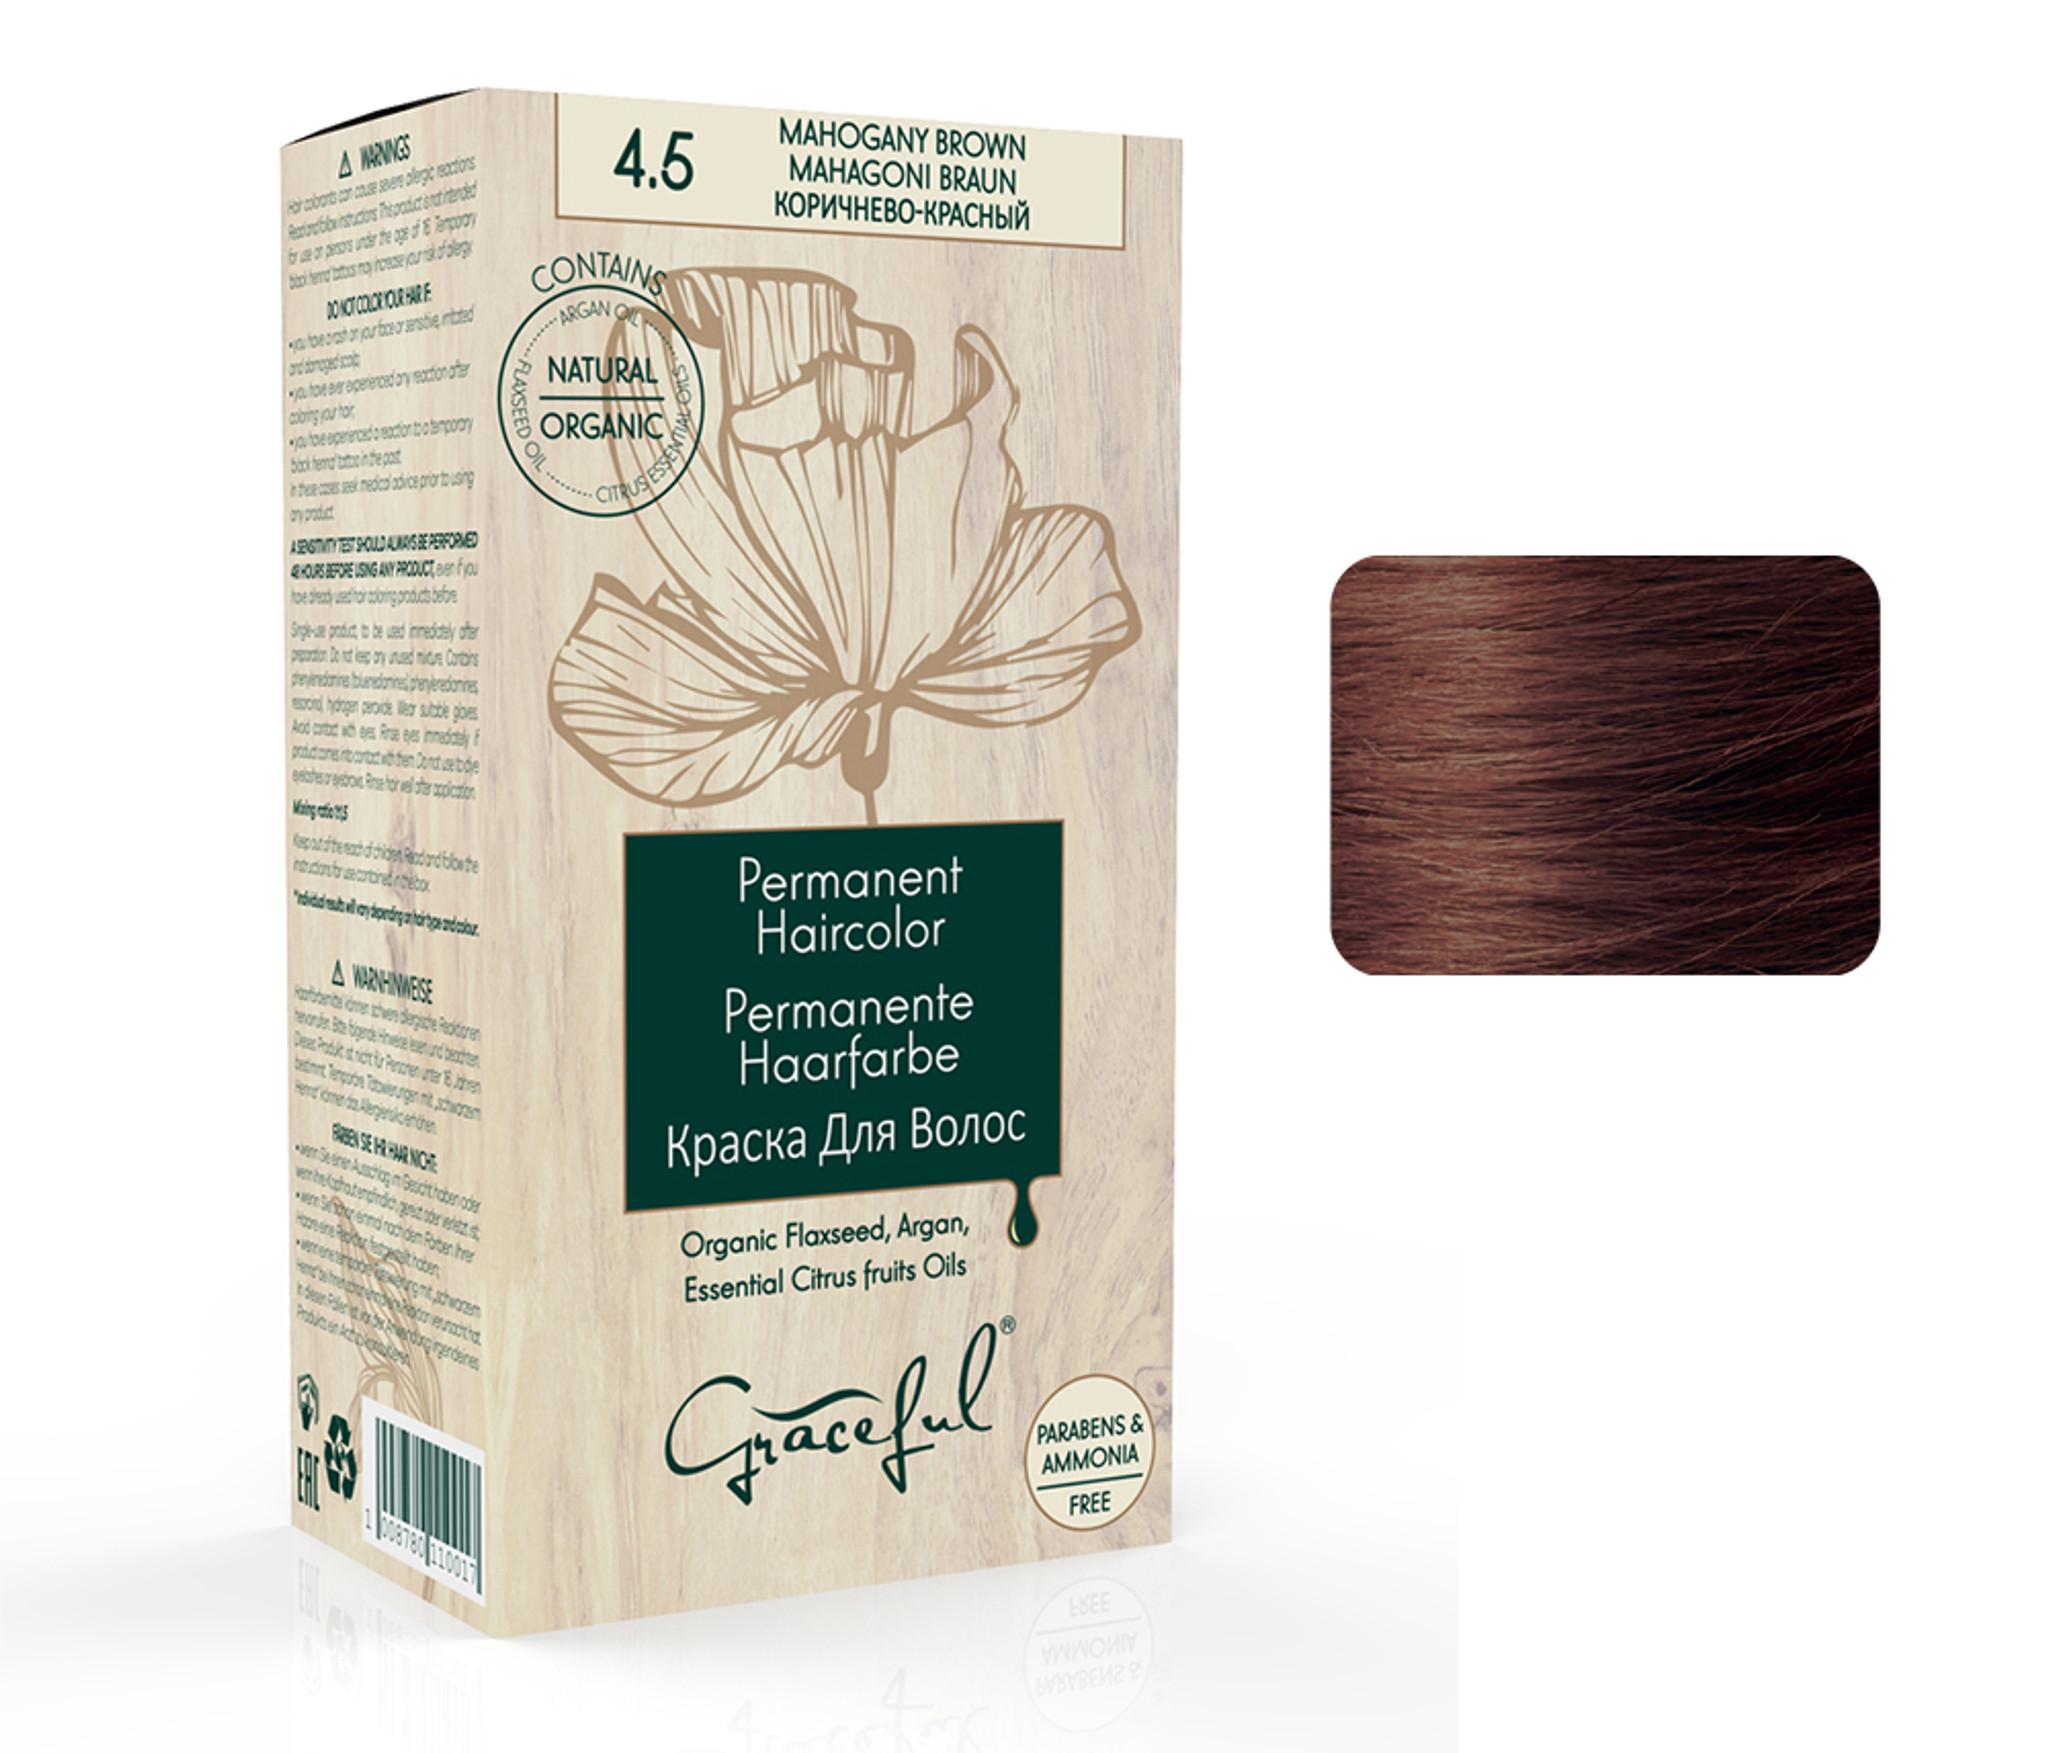 4.5 Mahogany Brown Graceful Hair Colour